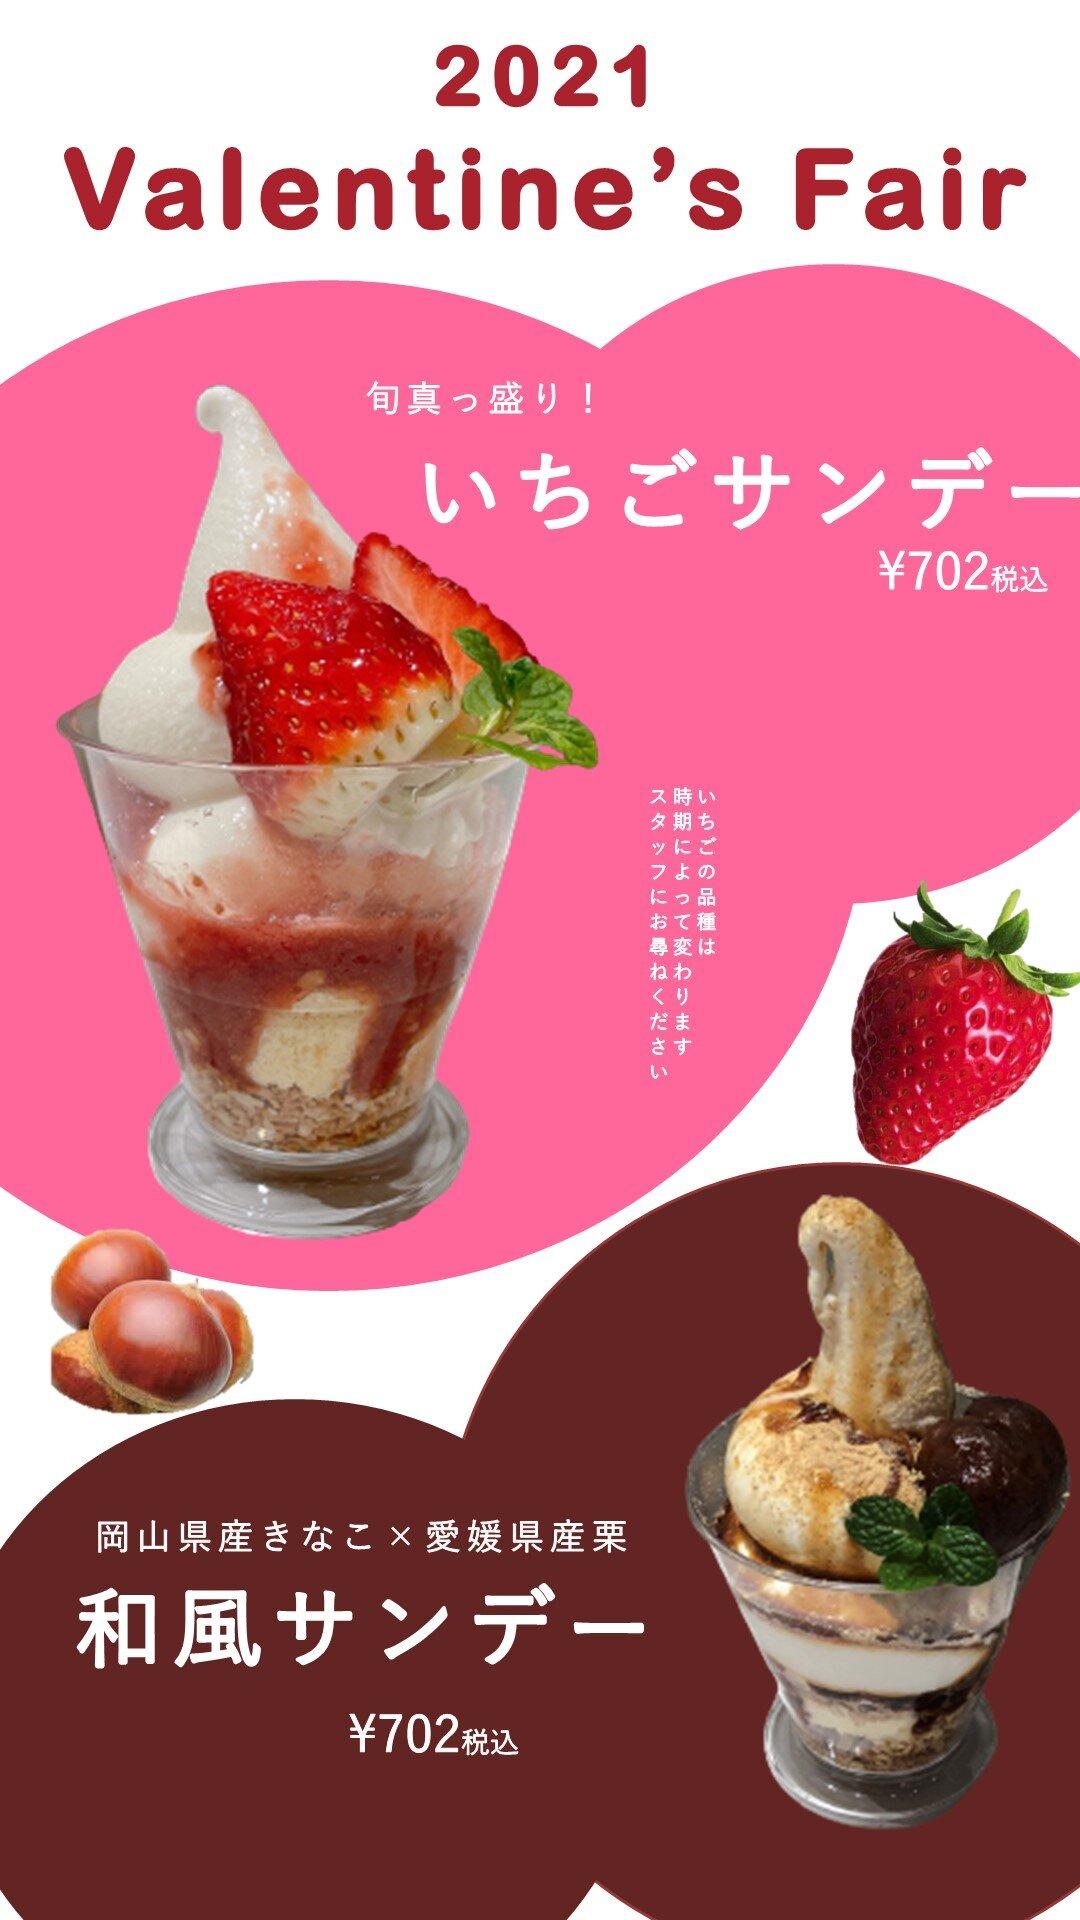 https://www.minoriminoru.jp/topics/61a47218a79a1db86402c4312bbcfe0f0d3d3e77.jpg